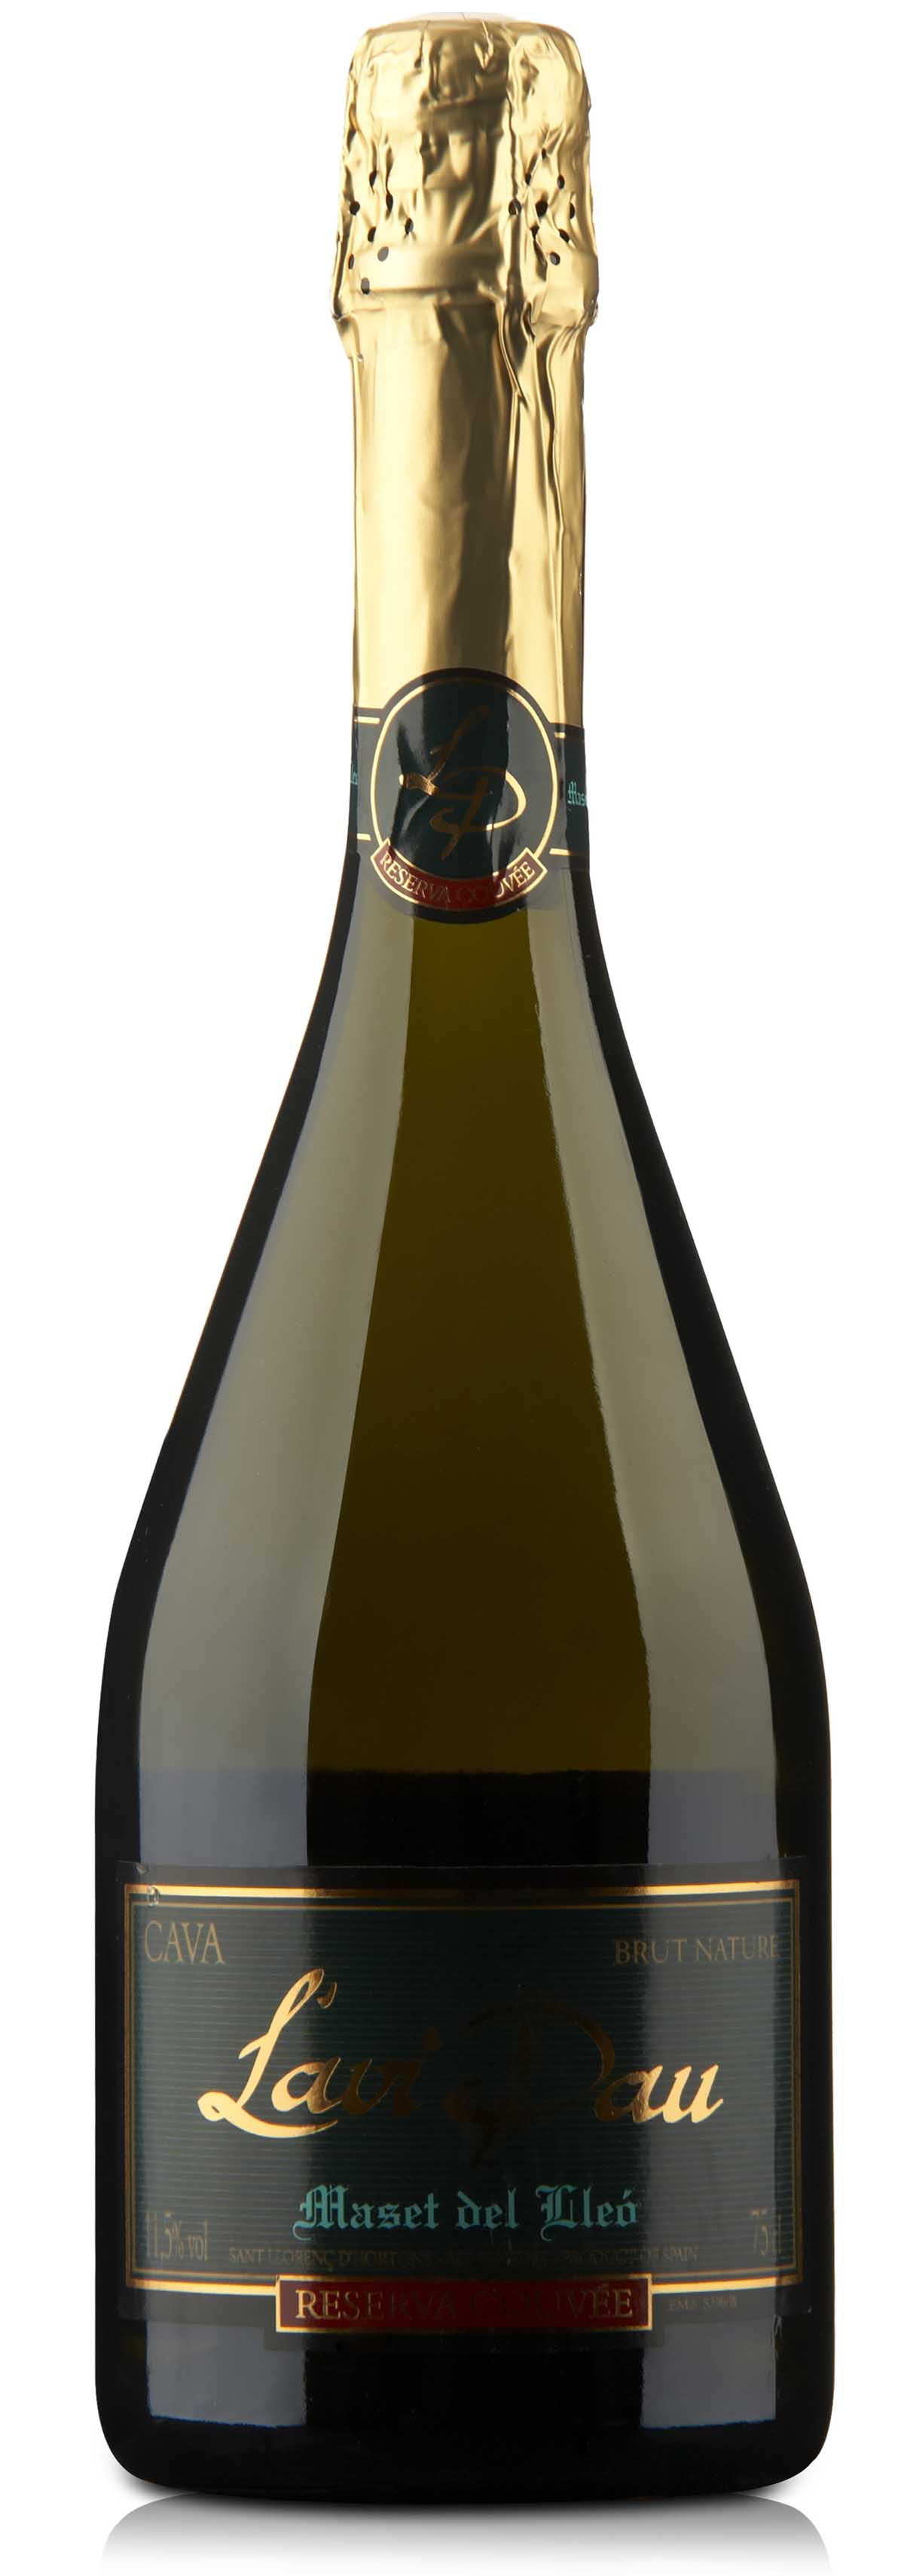 MASET 马赛特 拉维窖藏天然起泡葡萄酒